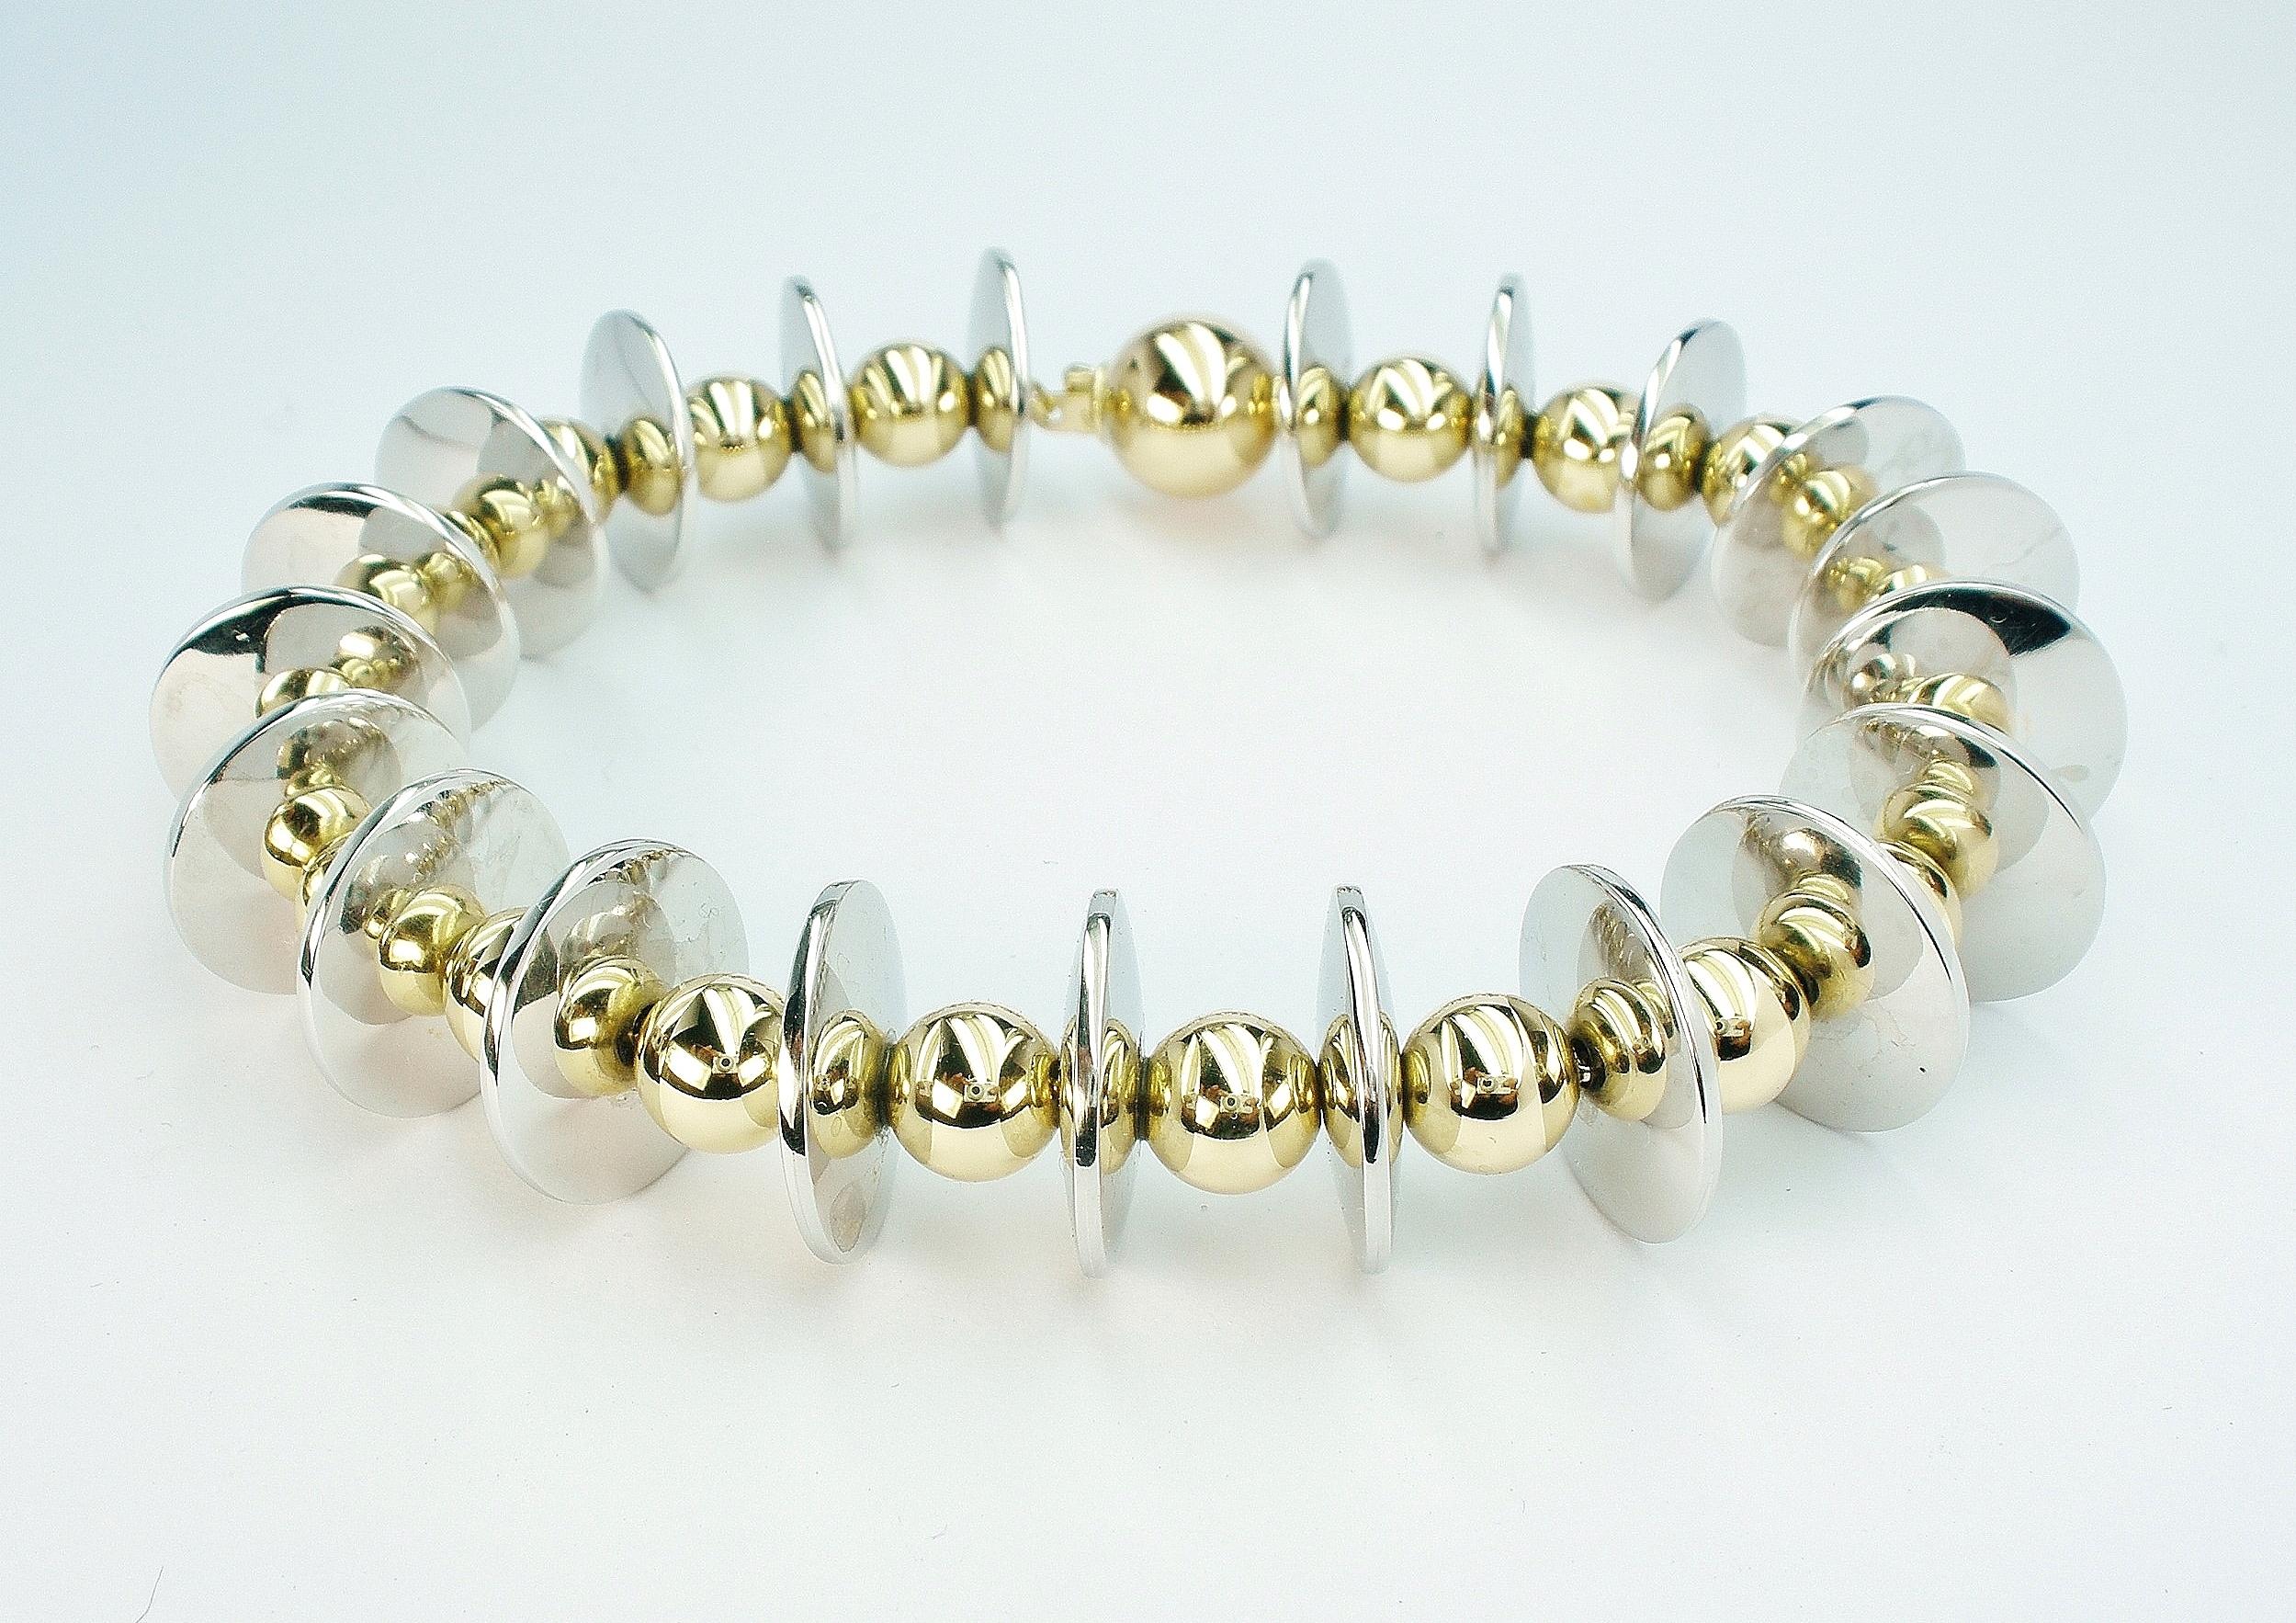 Handmade palladium disc & 18ct. yellow gold ball bracelet.